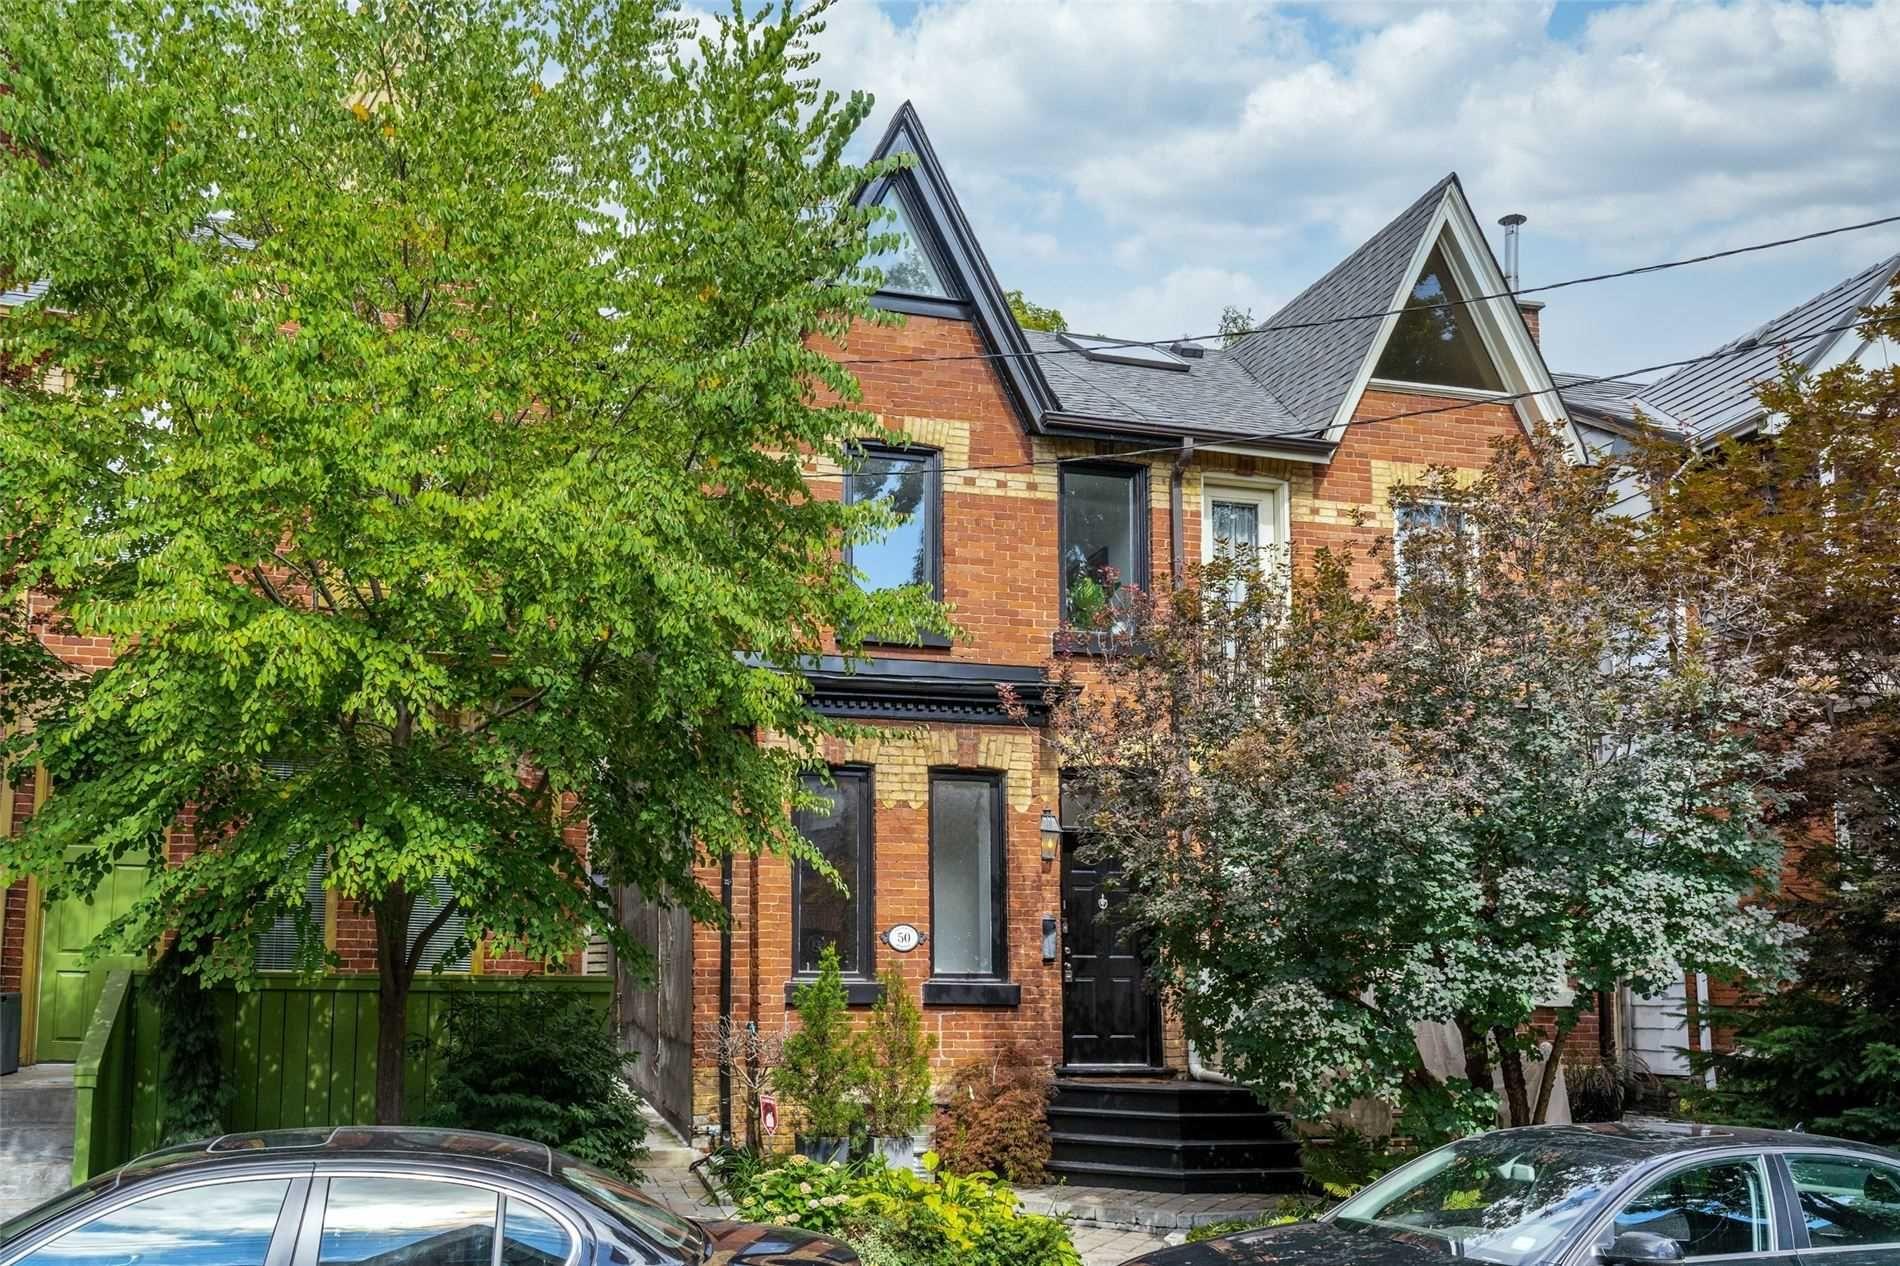 Main Photo: 50 Salisbury Avenue in Toronto: Cabbagetown-South St. James Town House (2 1/2 Storey) for sale (Toronto C08)  : MLS®# C5384304